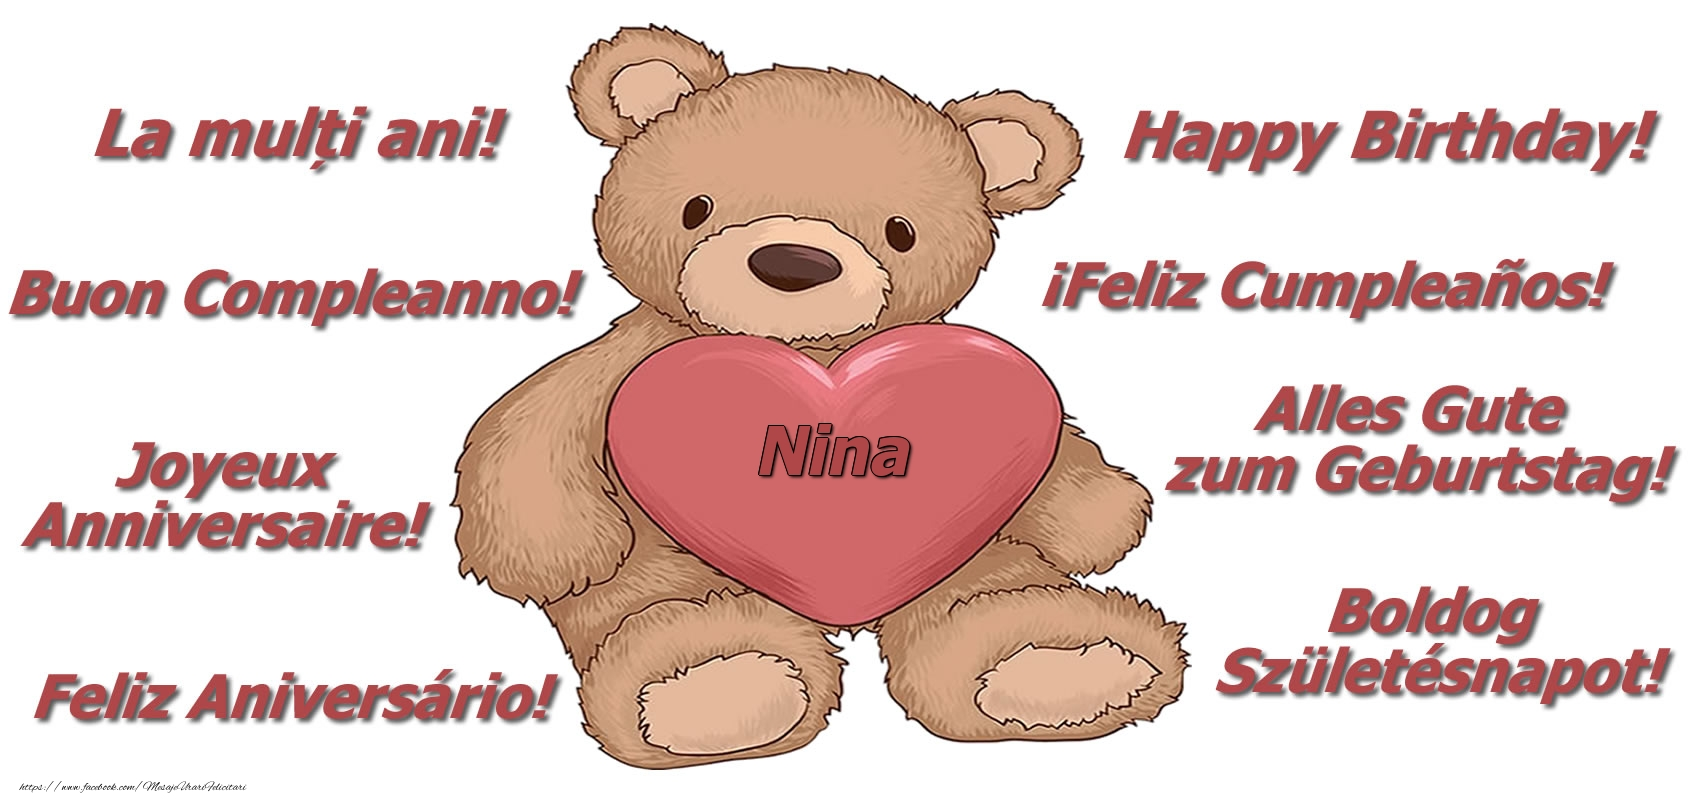 Felicitari de zi de nastere - La multi ani Nina! - Ursulet